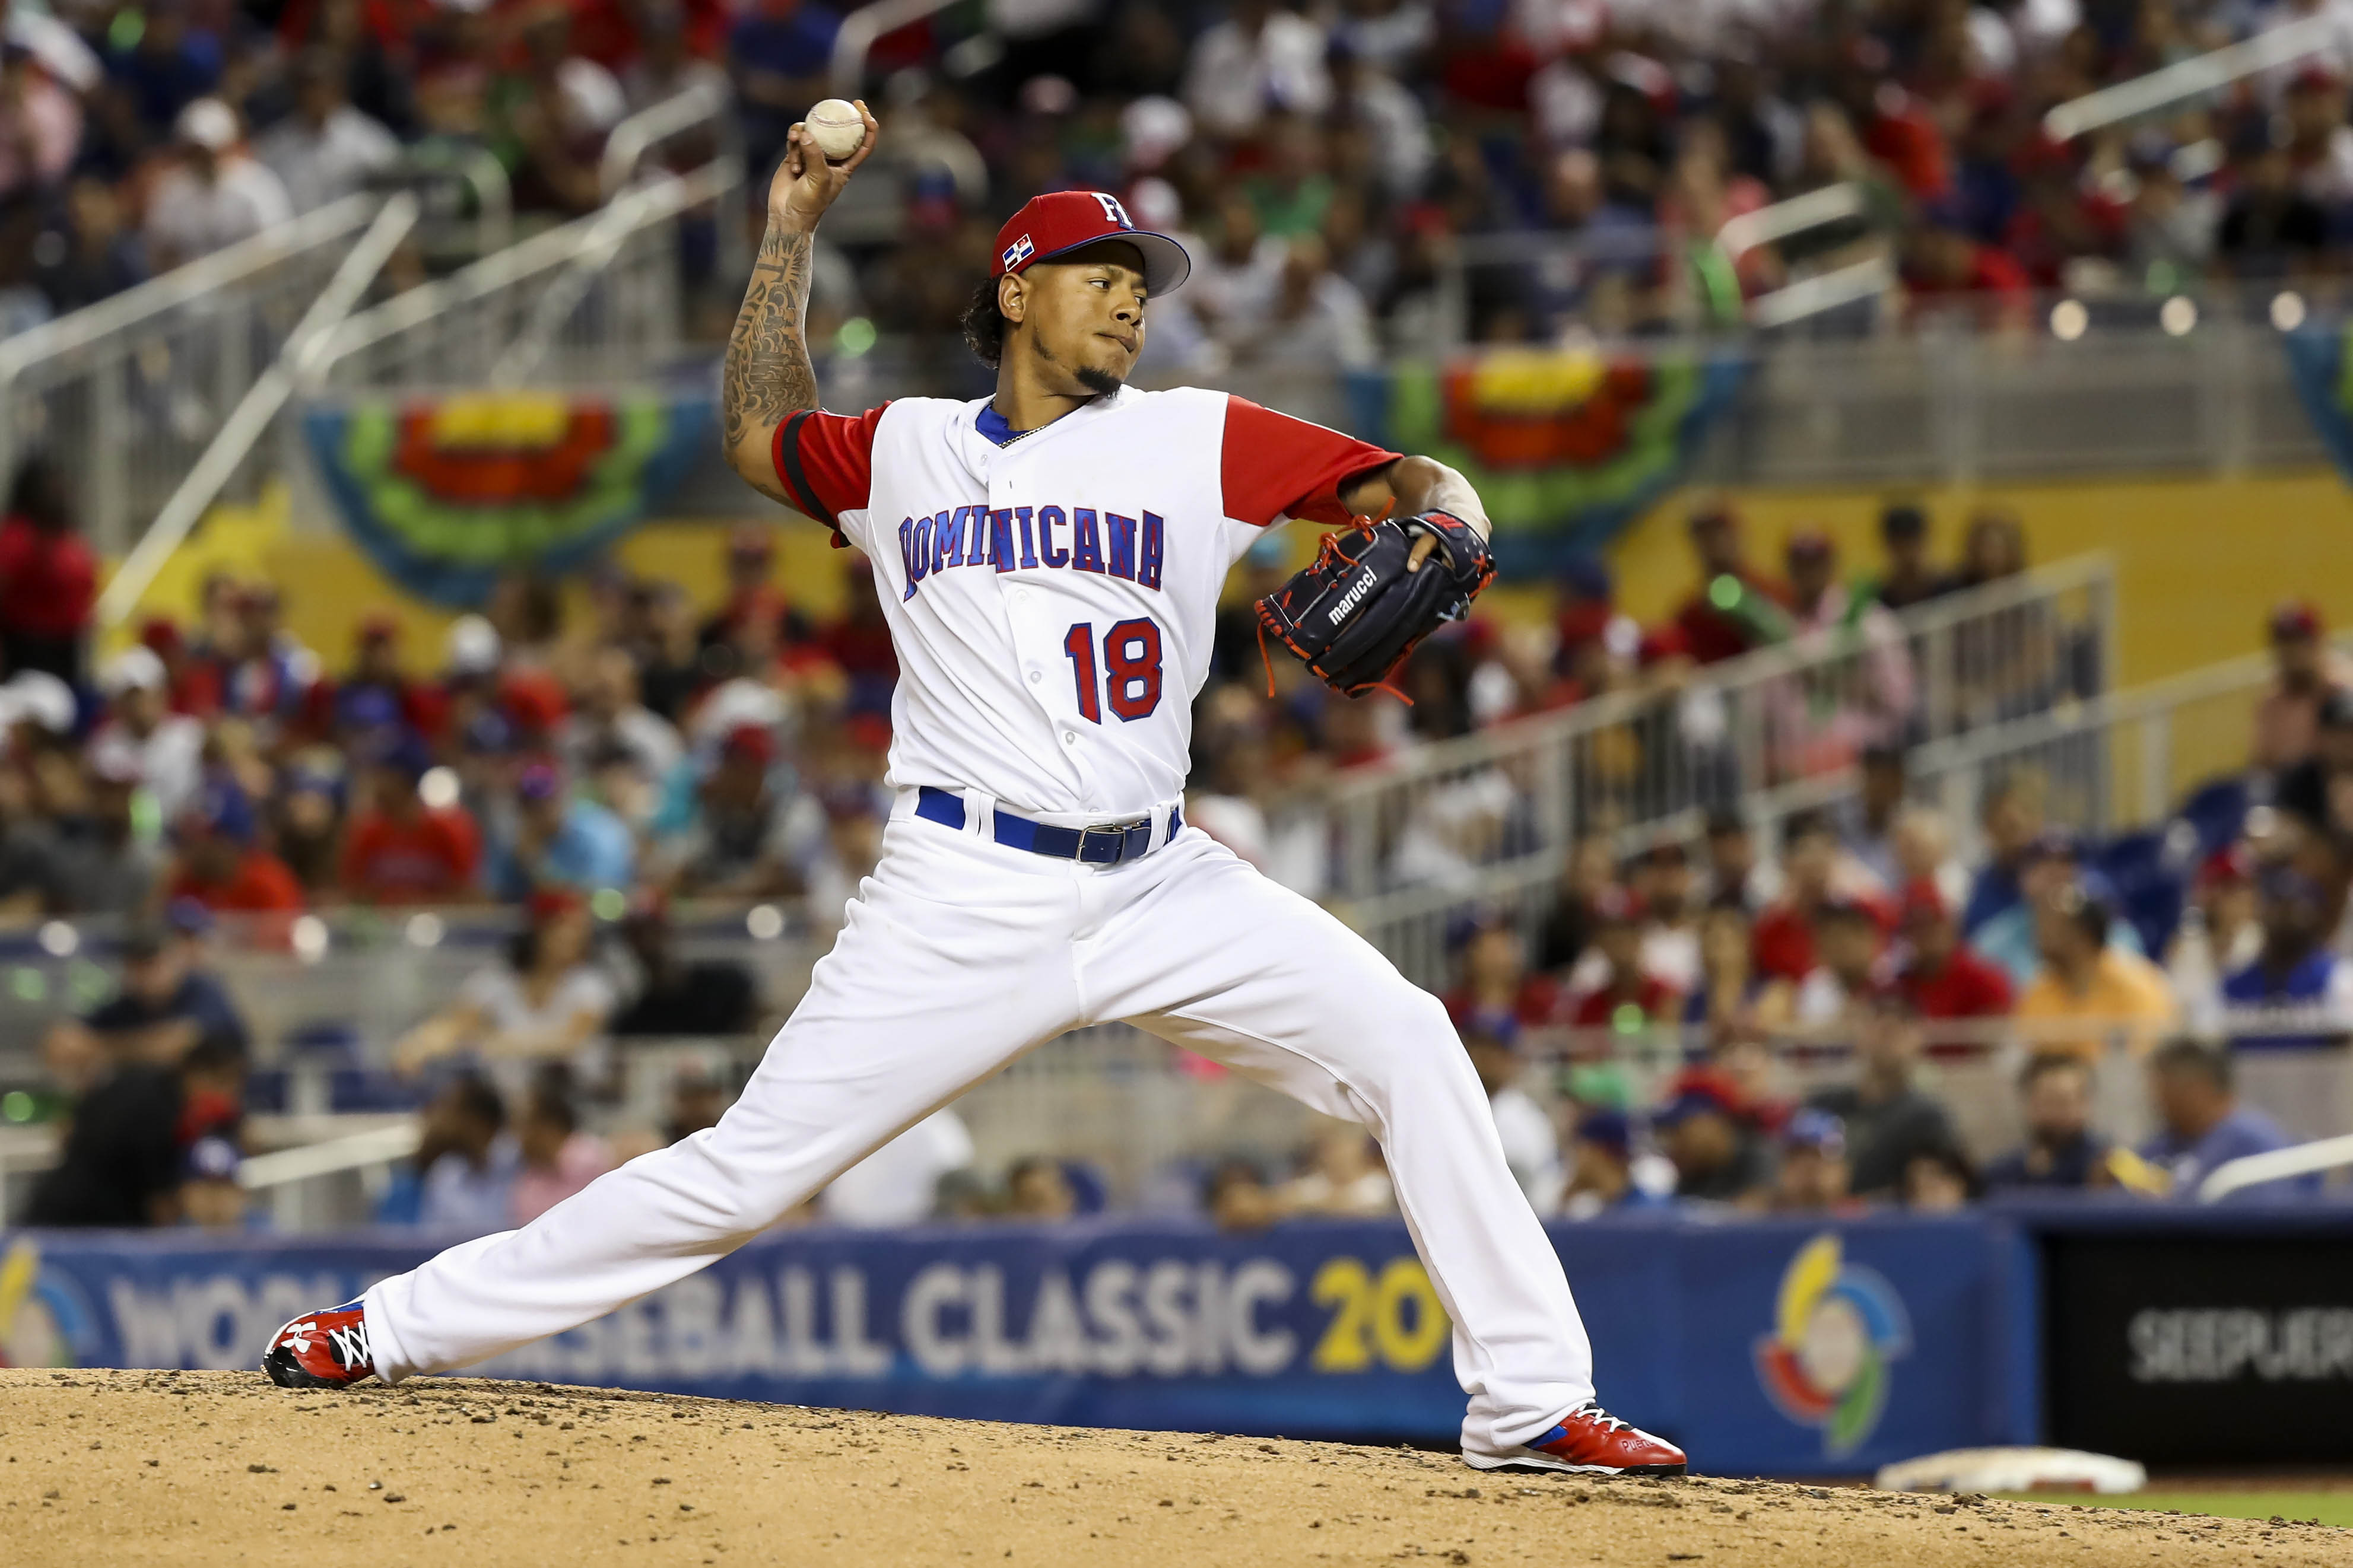 9928413-baseball-world-baseball-classic-canada-at-dominican-republic